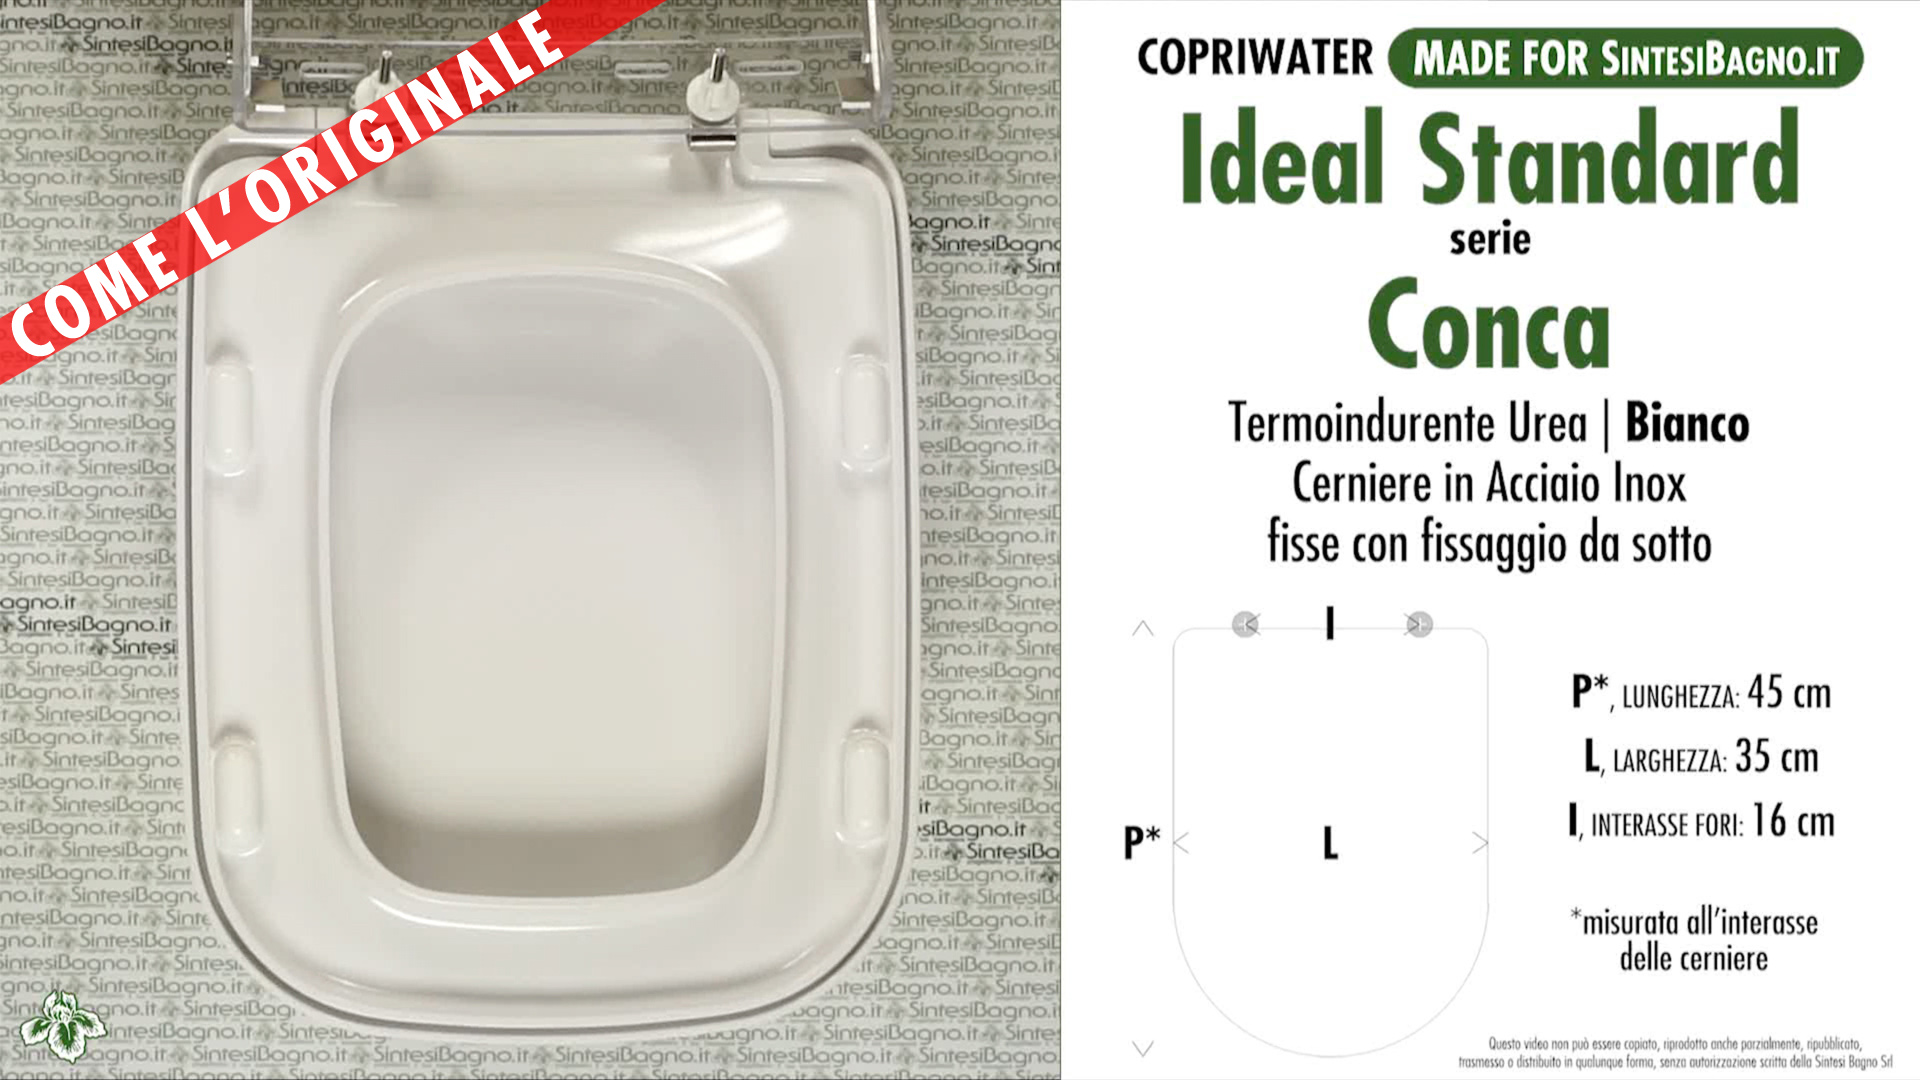 Sedile Conca Ideal Standard Originale.Copriwater Per Wc Conca Ideal Standard Ricambio Come L Originale Duroplast Sintesibagno Shop Online